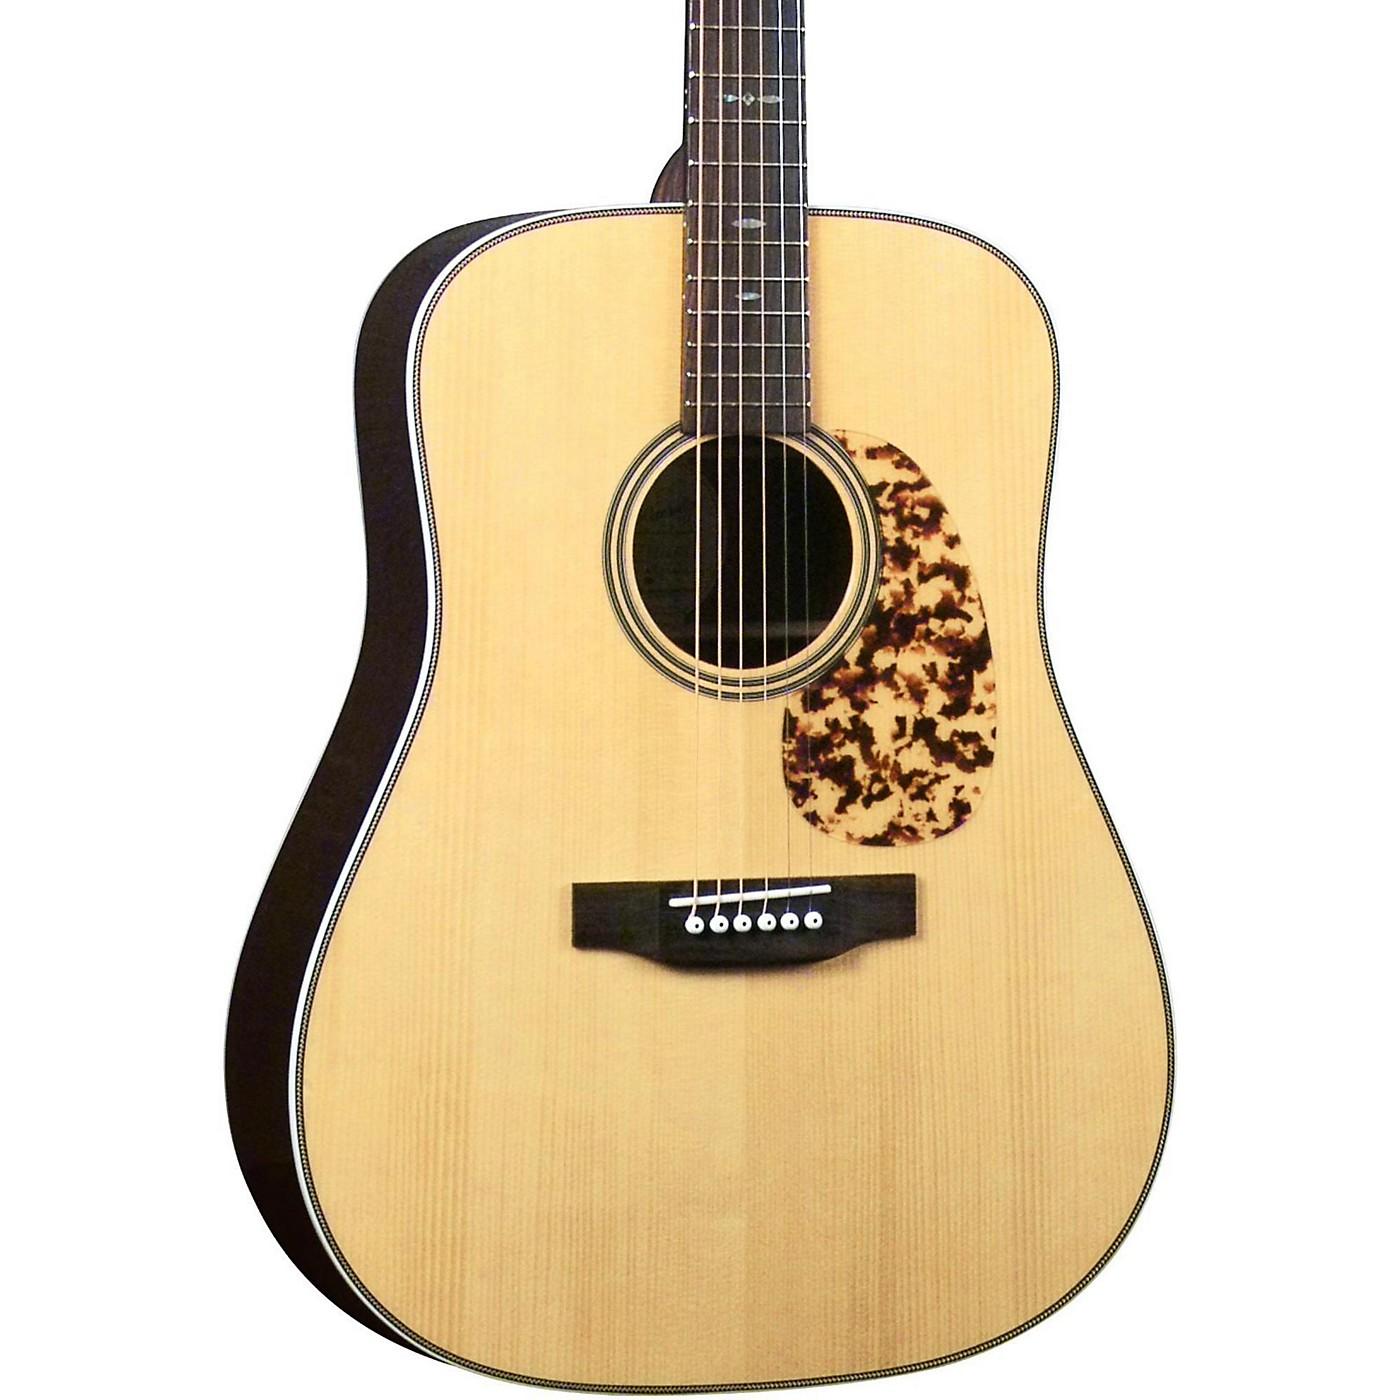 Blueridge BR-160A Adirondack Top Craftsman Series Dreadnought Acoustic Guitar thumbnail